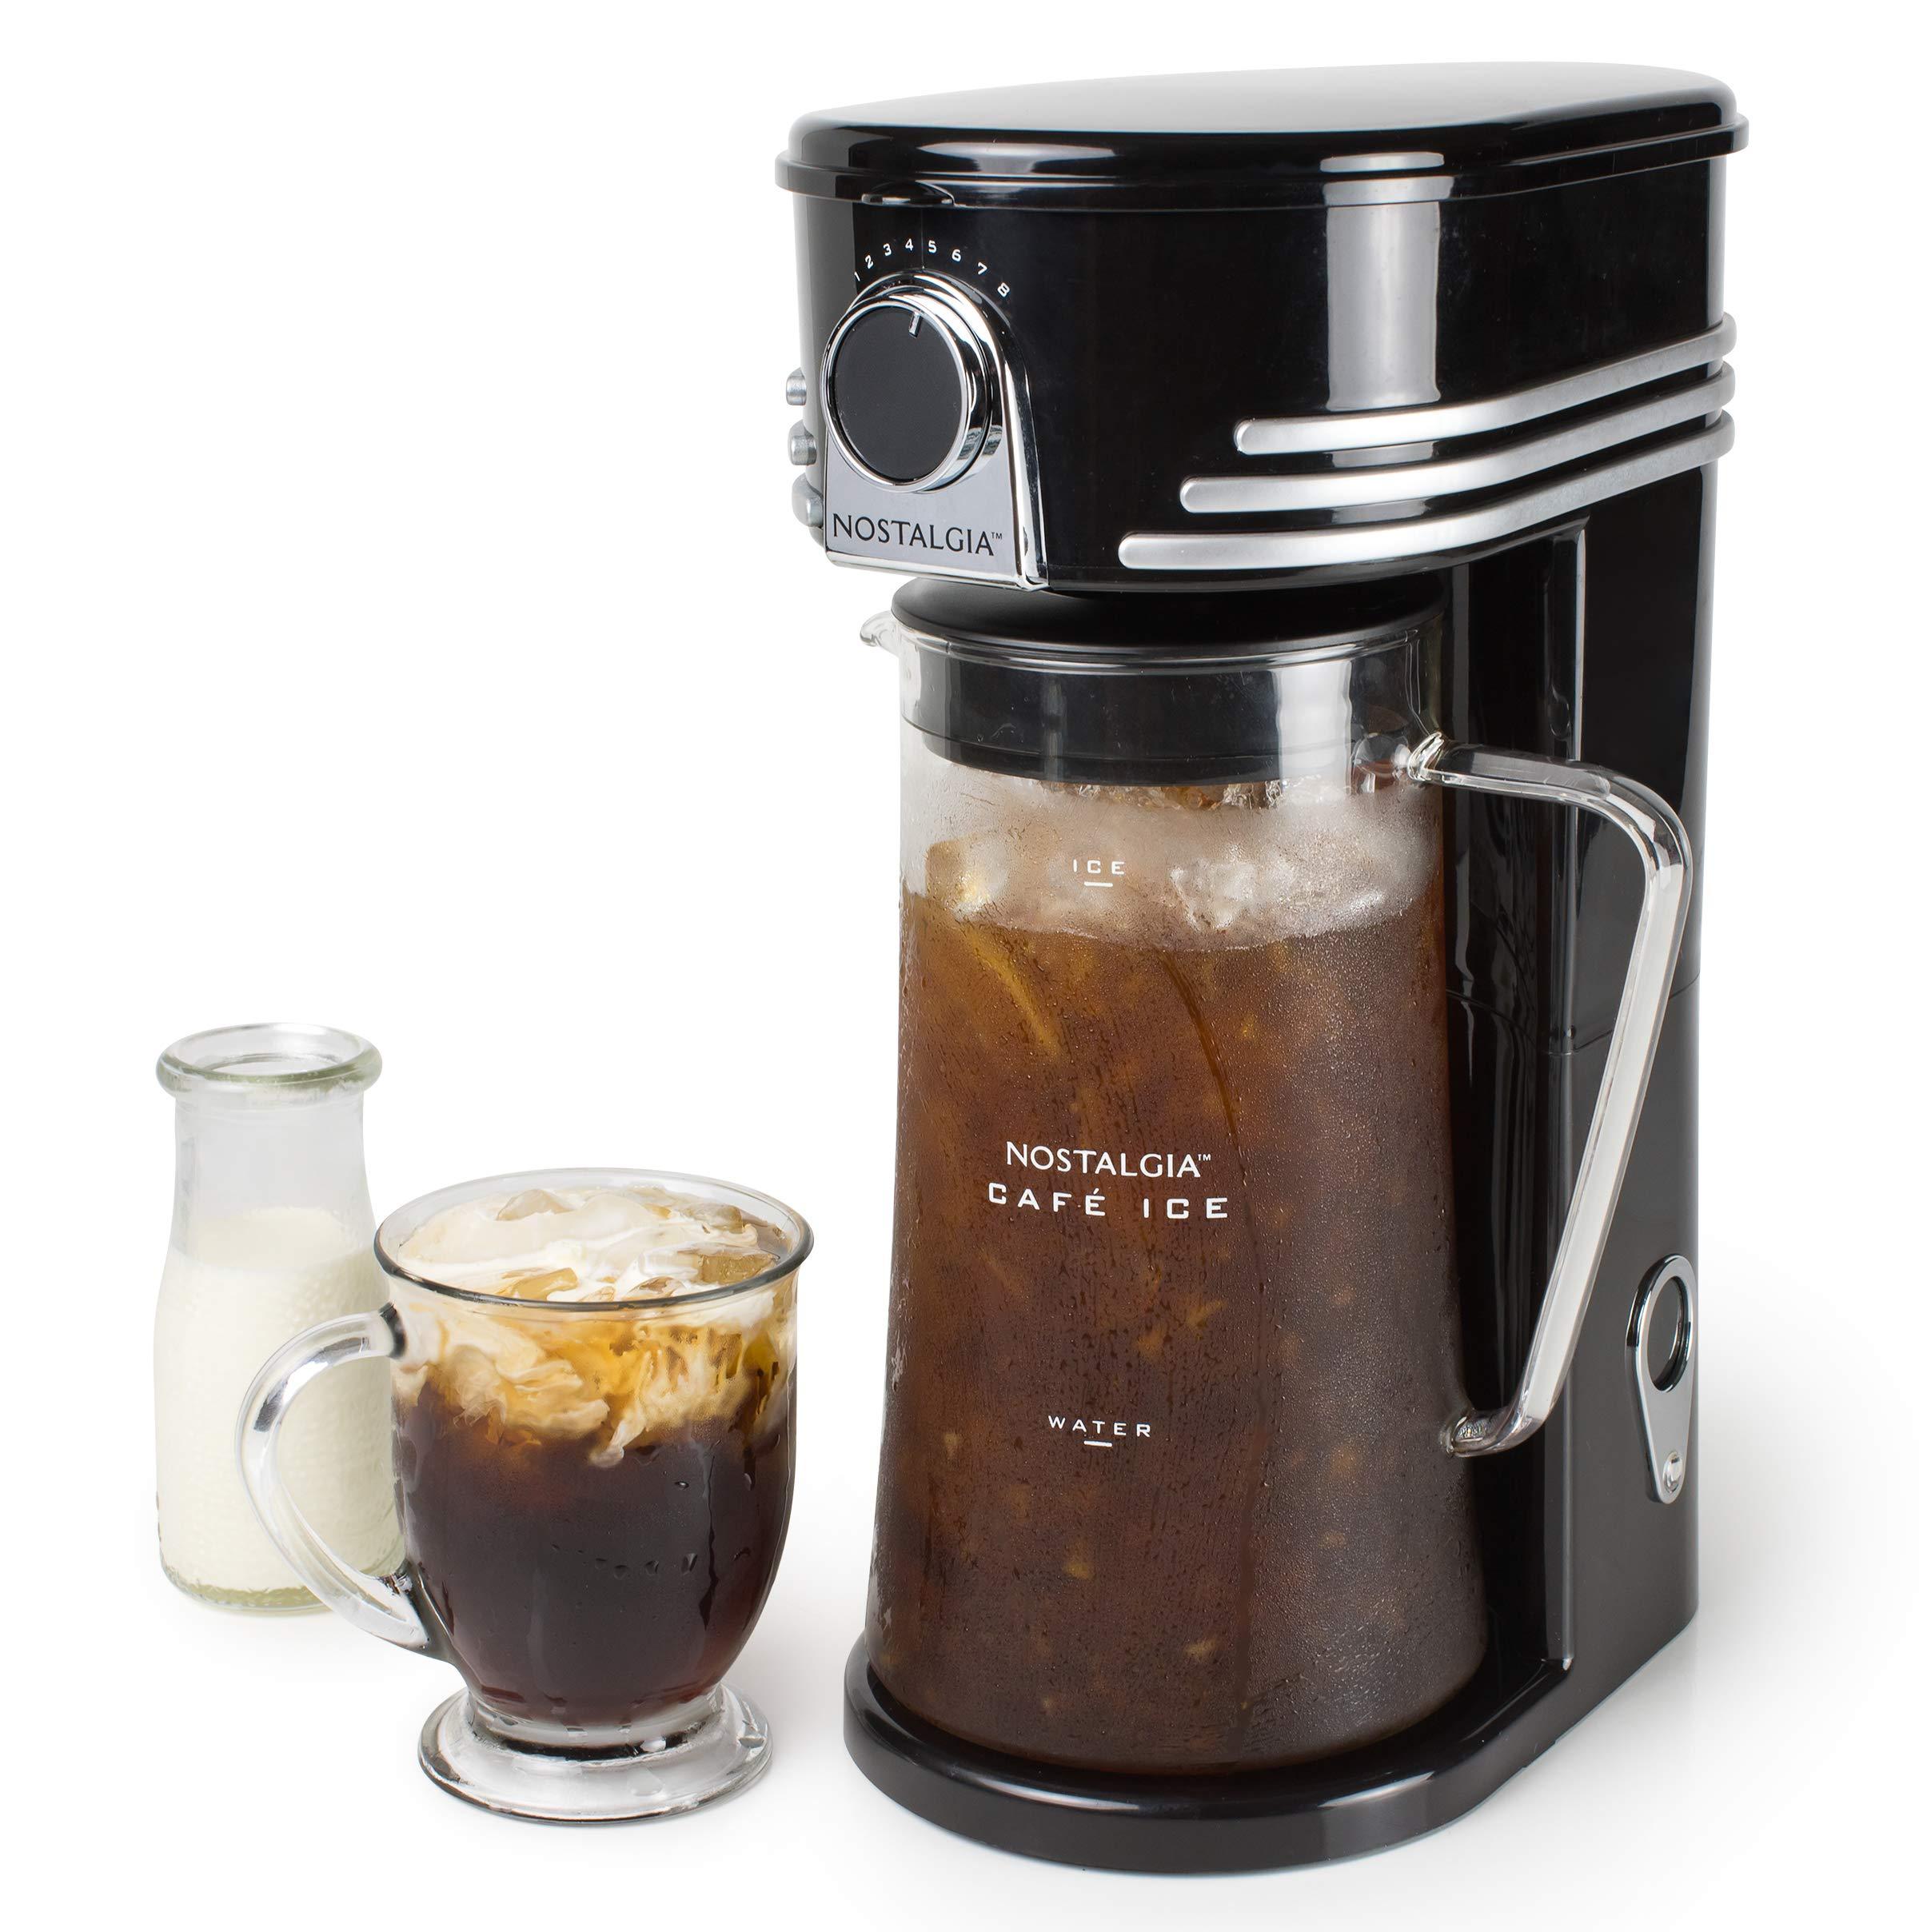 Nostalgia CI3BK Iced Coffee Maker and Tea Brewing System, Glass Pitcher, 3 quart Black by Nostalgia (Image #4)